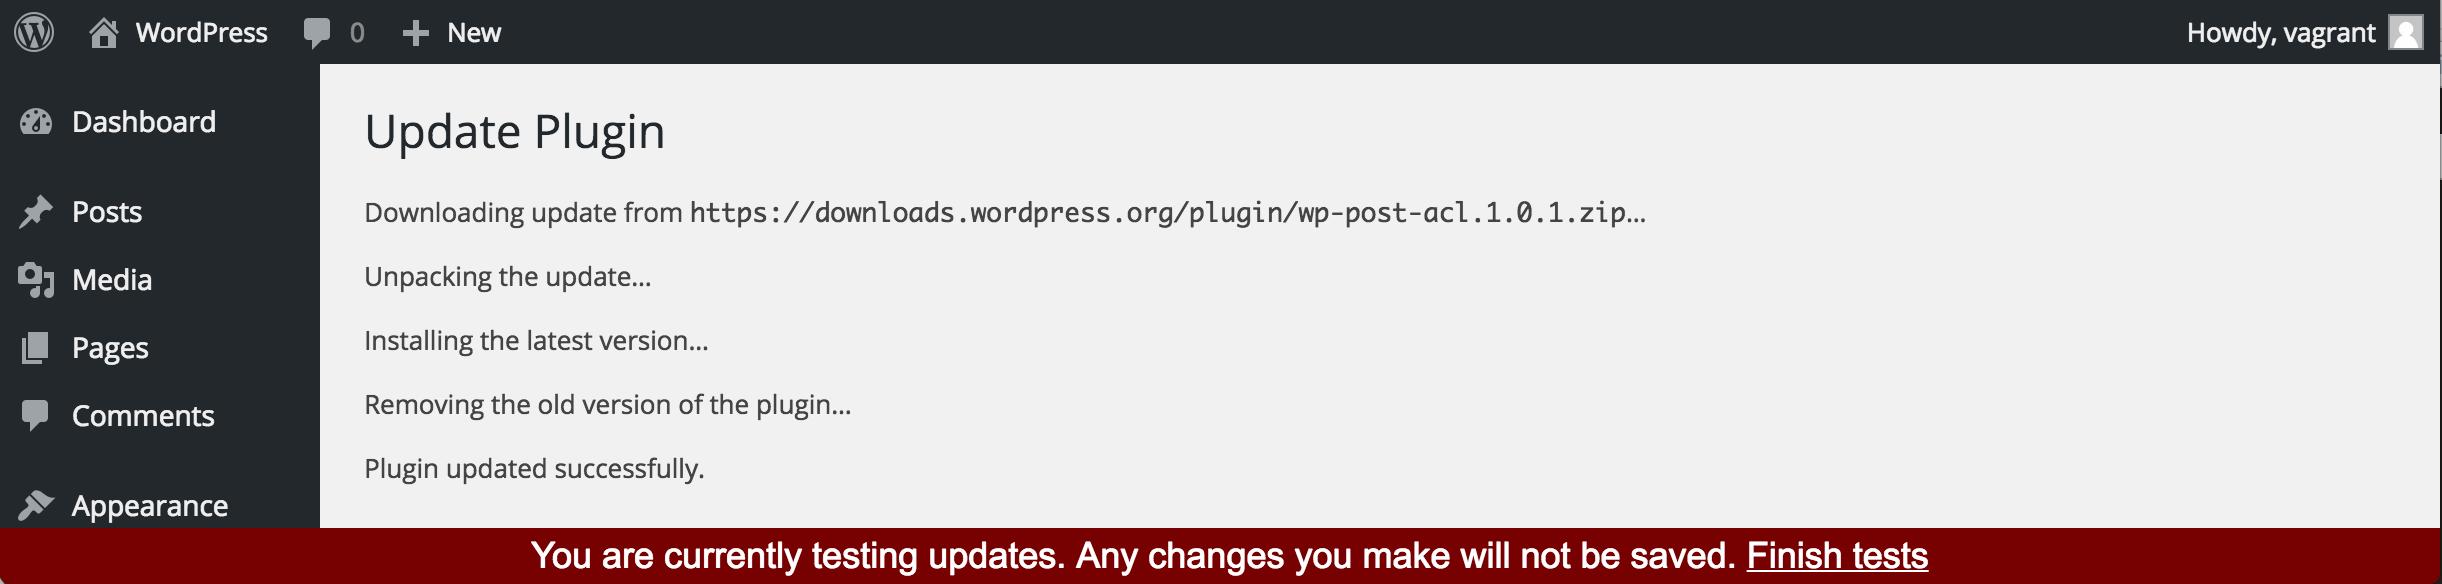 updating-plugin-in-sandbox